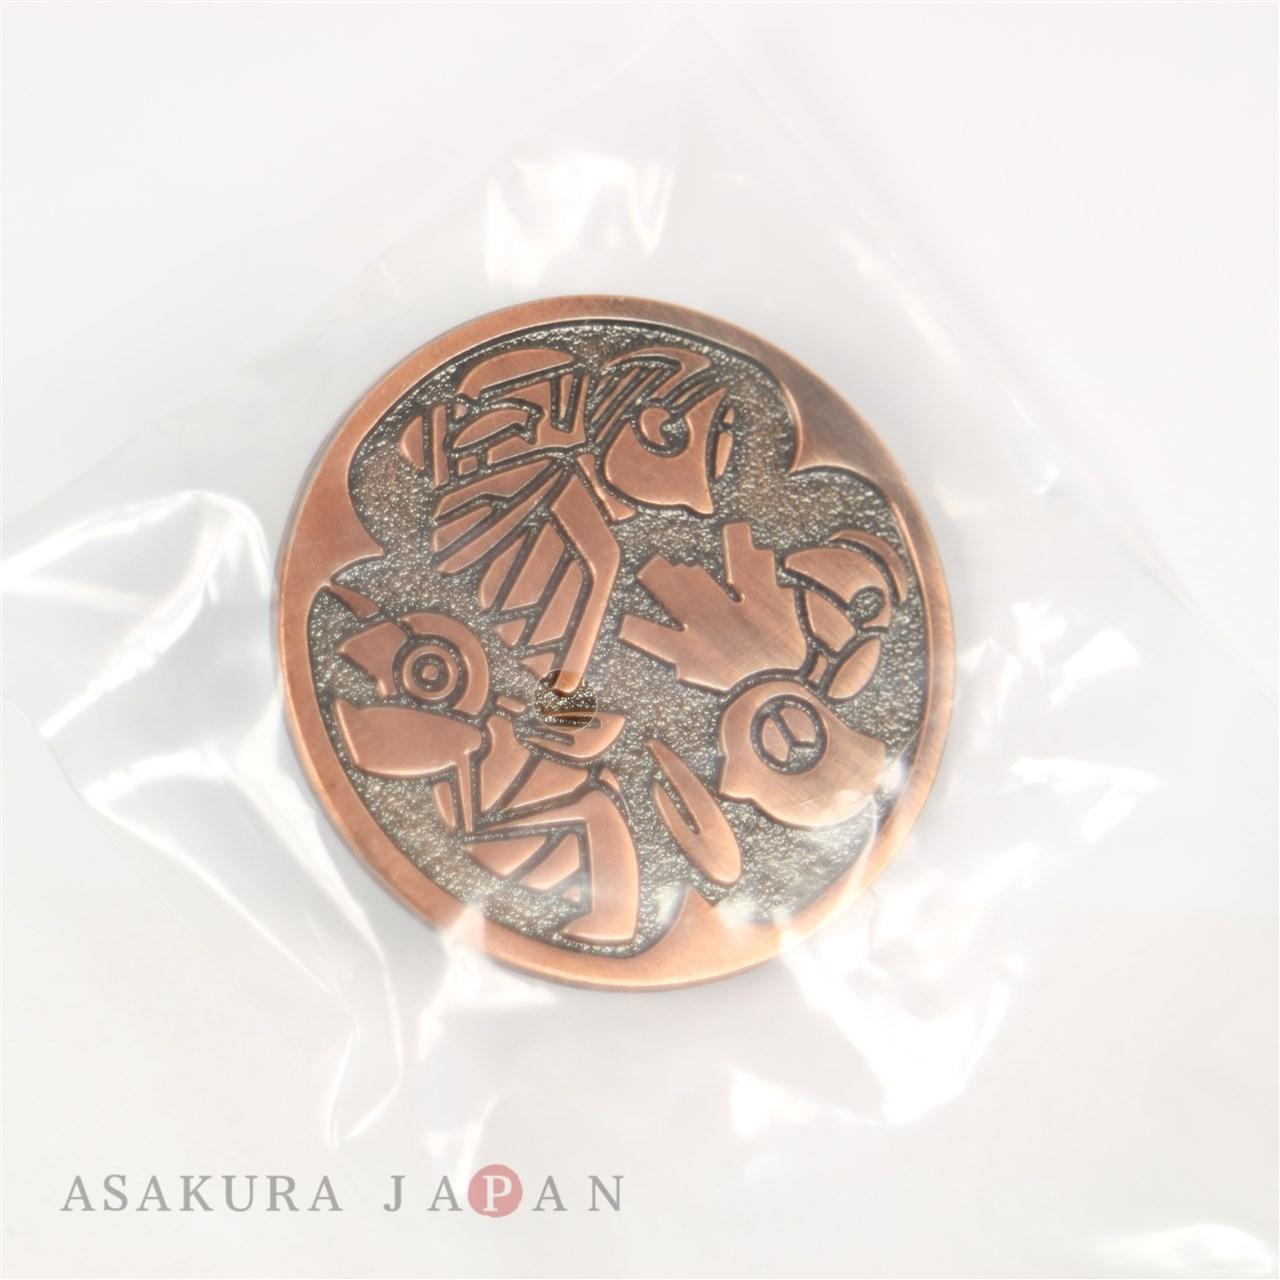 Shedinja Ninjask Nincada Pokemon Center Pin Collection Hyaku Poke Yako Authentic